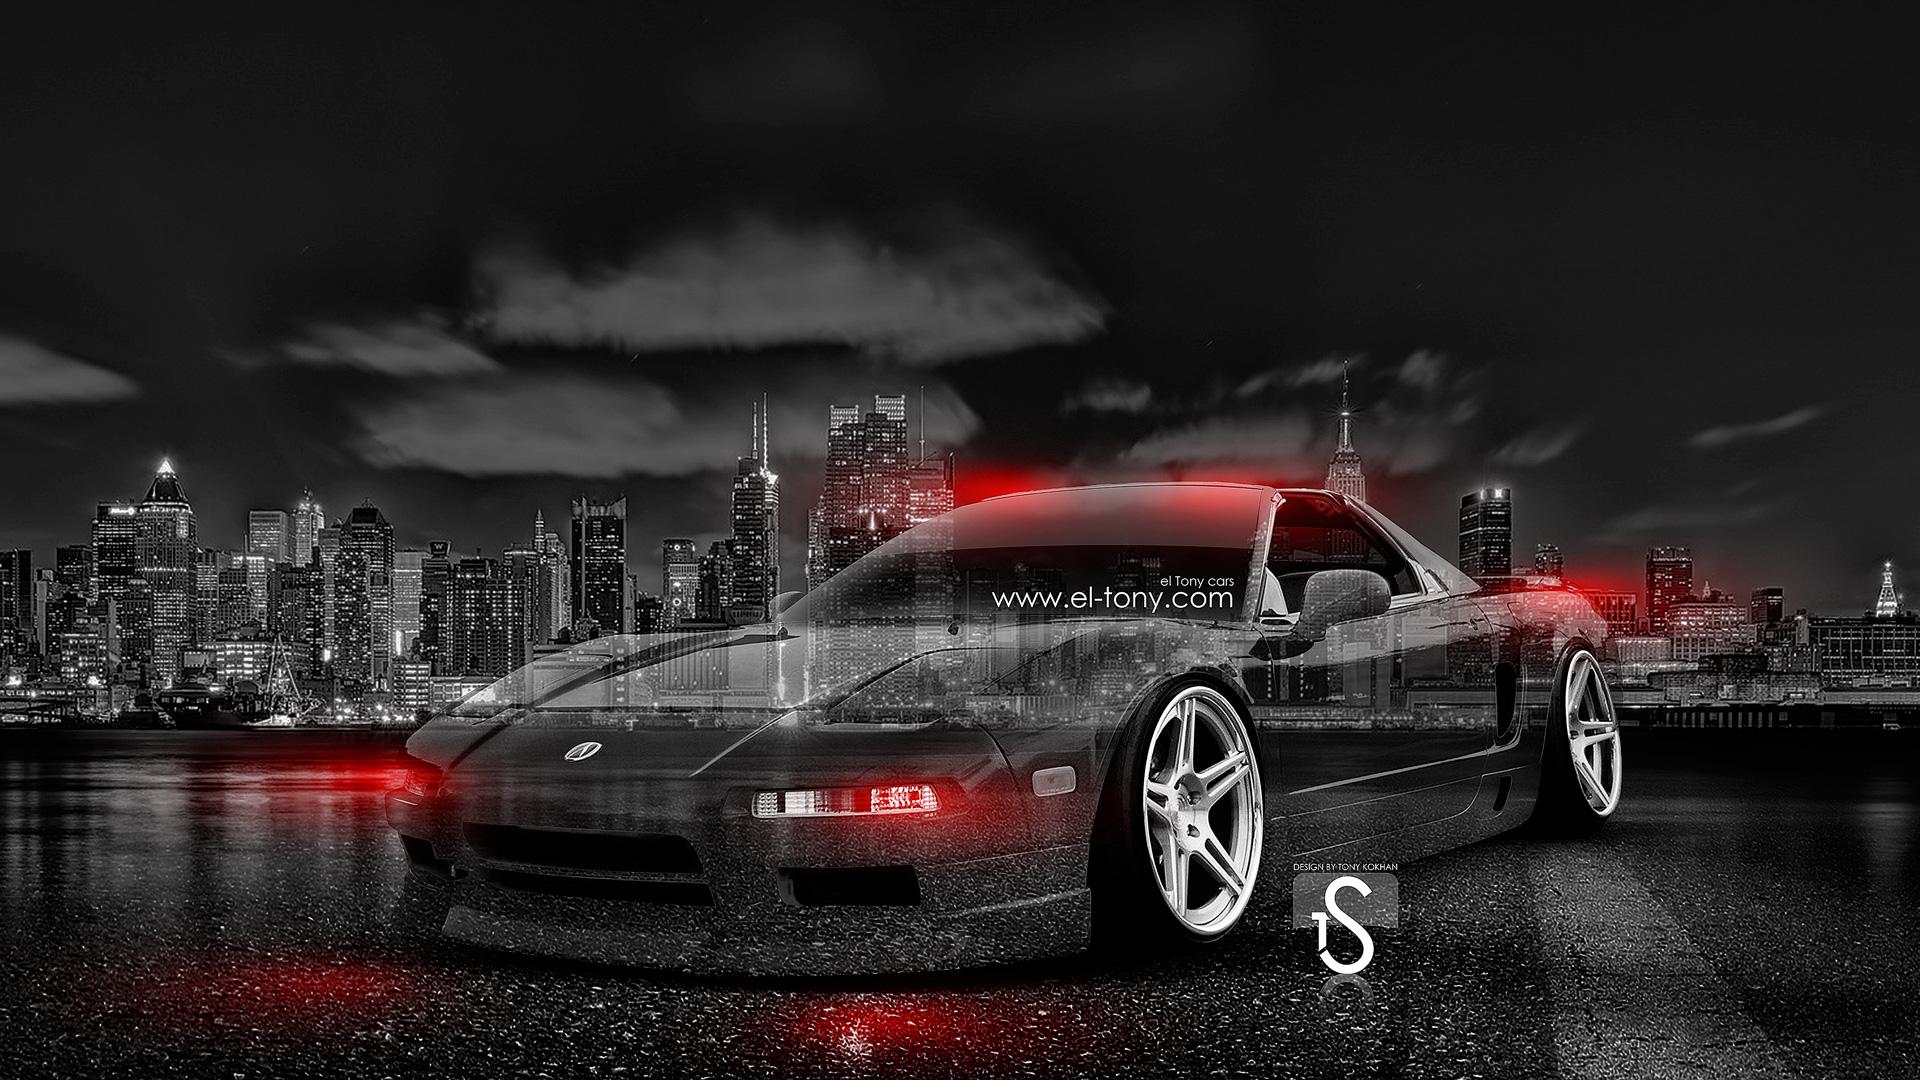 Honda NSX JDM Crystal City Car 2014 Orange Neon HD Wallpapers Design  1920x1080